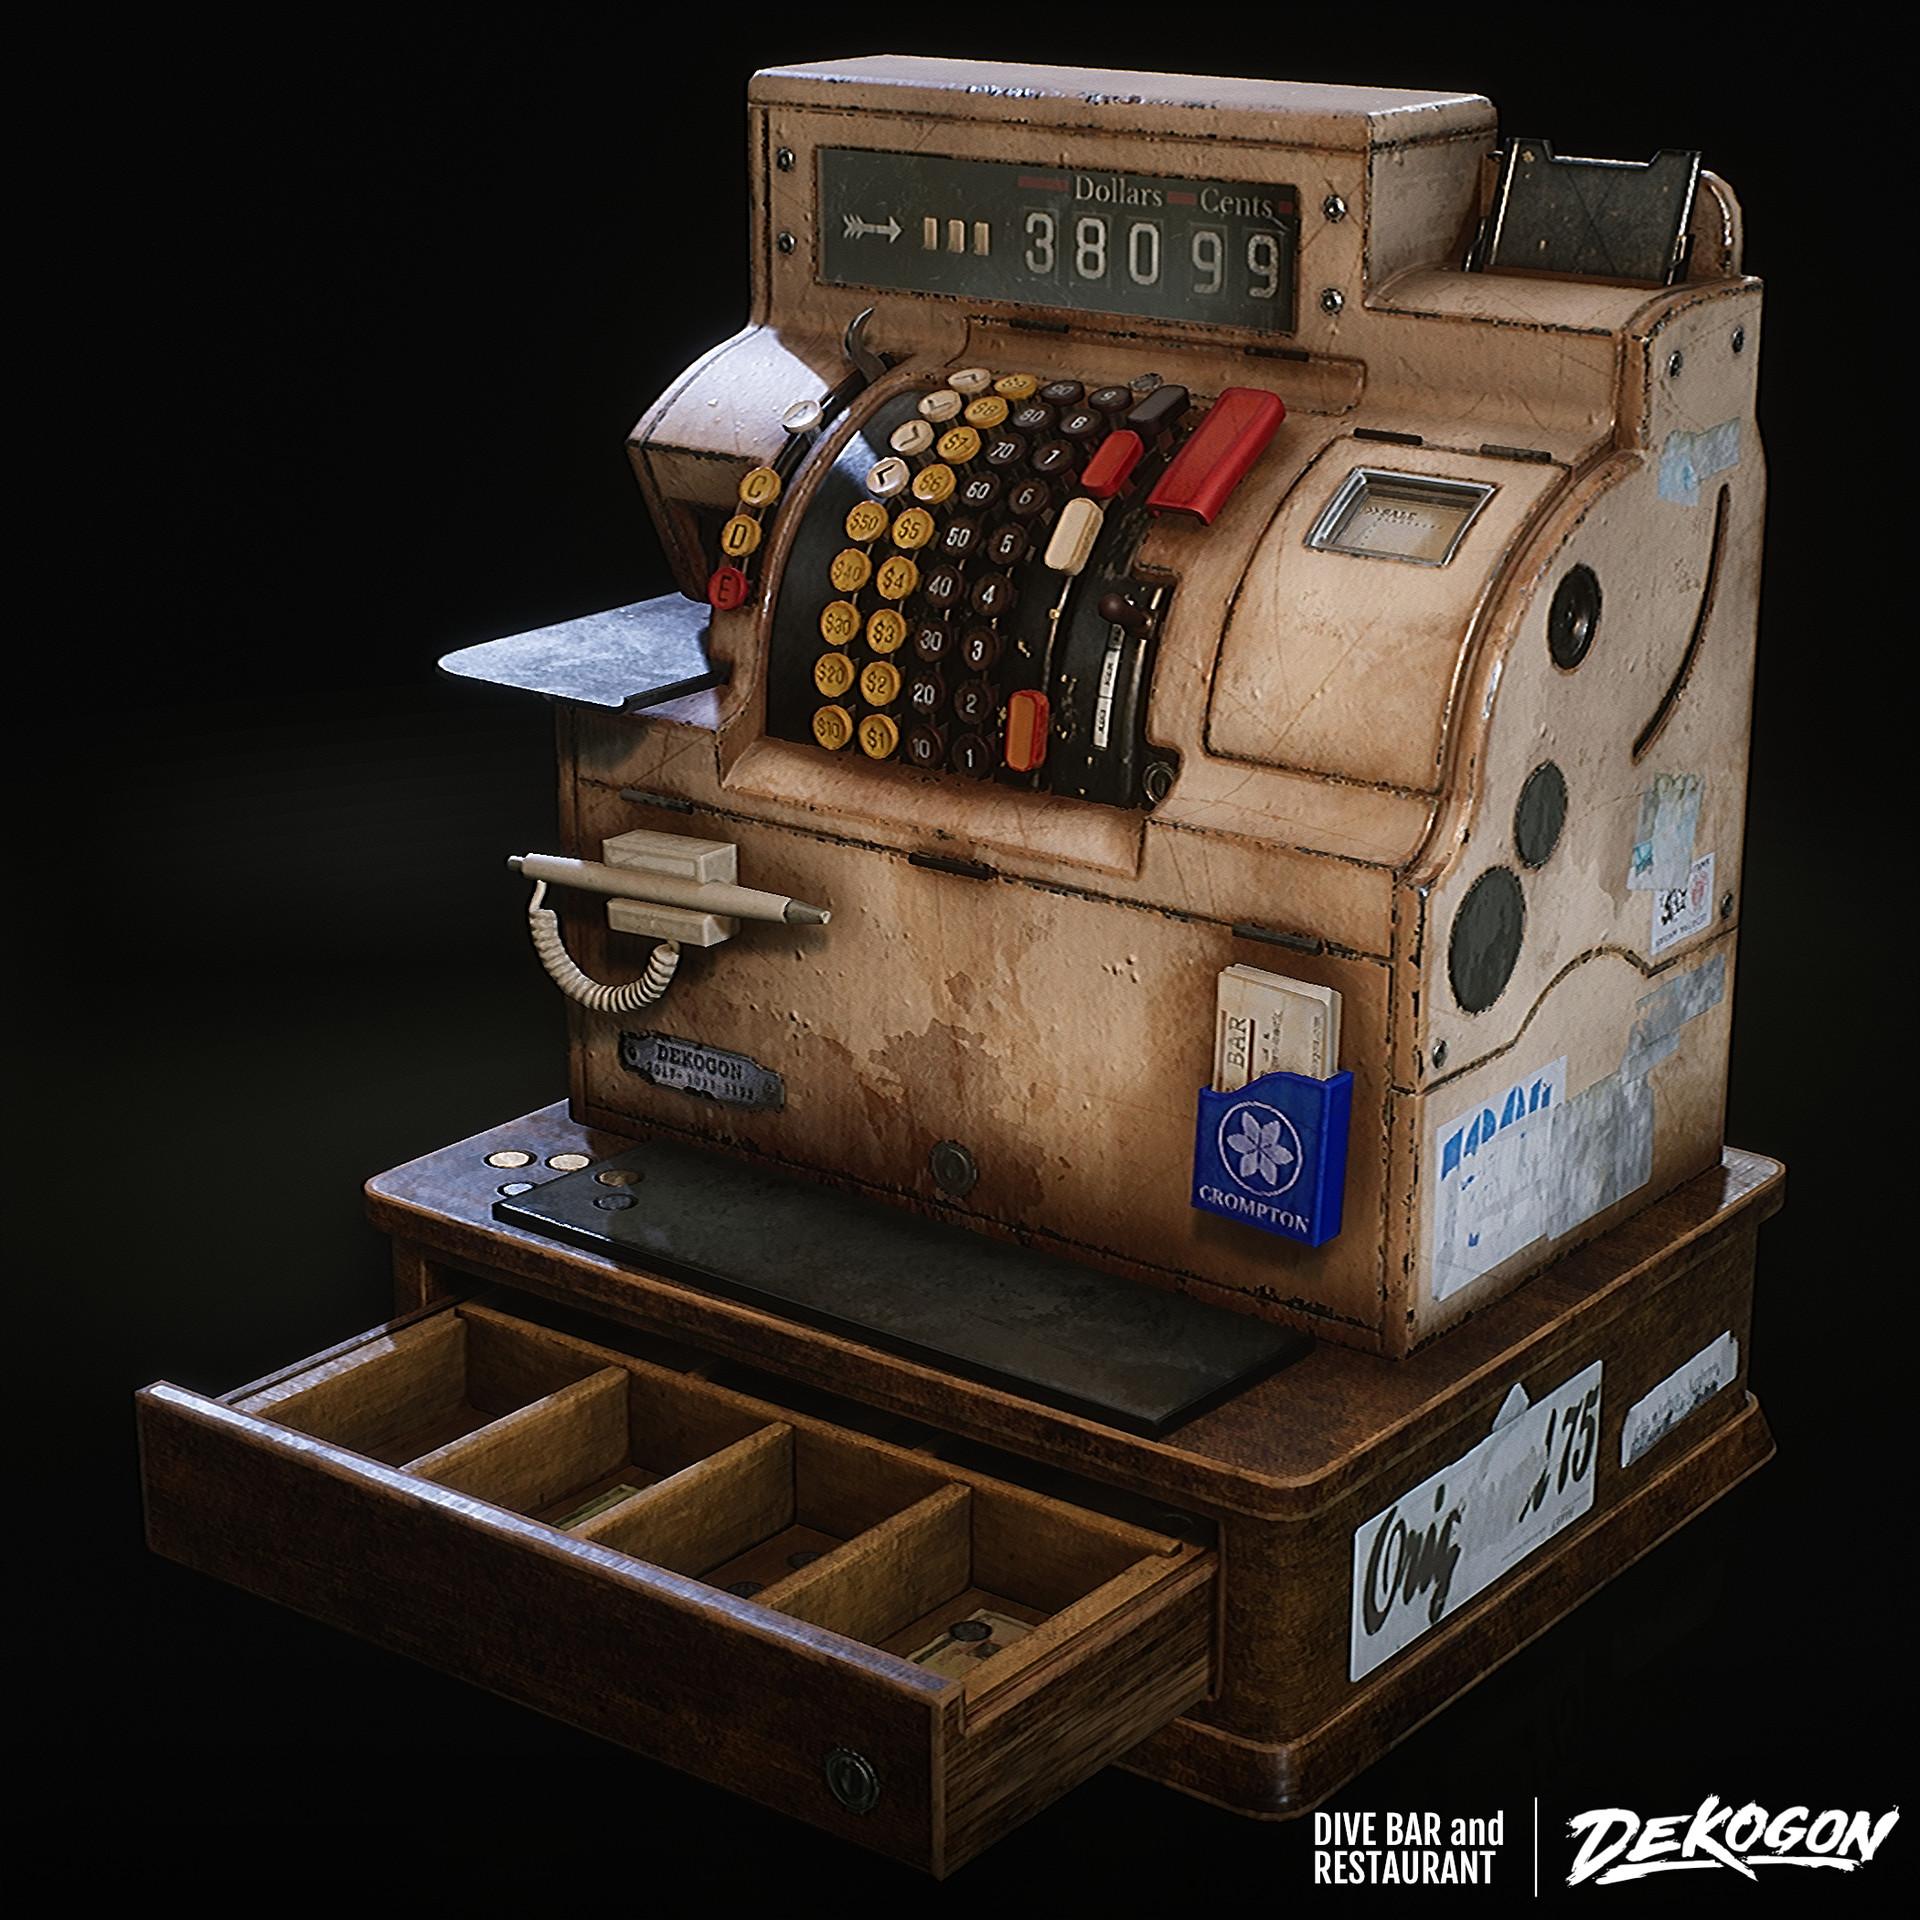 Wahyu nugraha cashregister 01 03